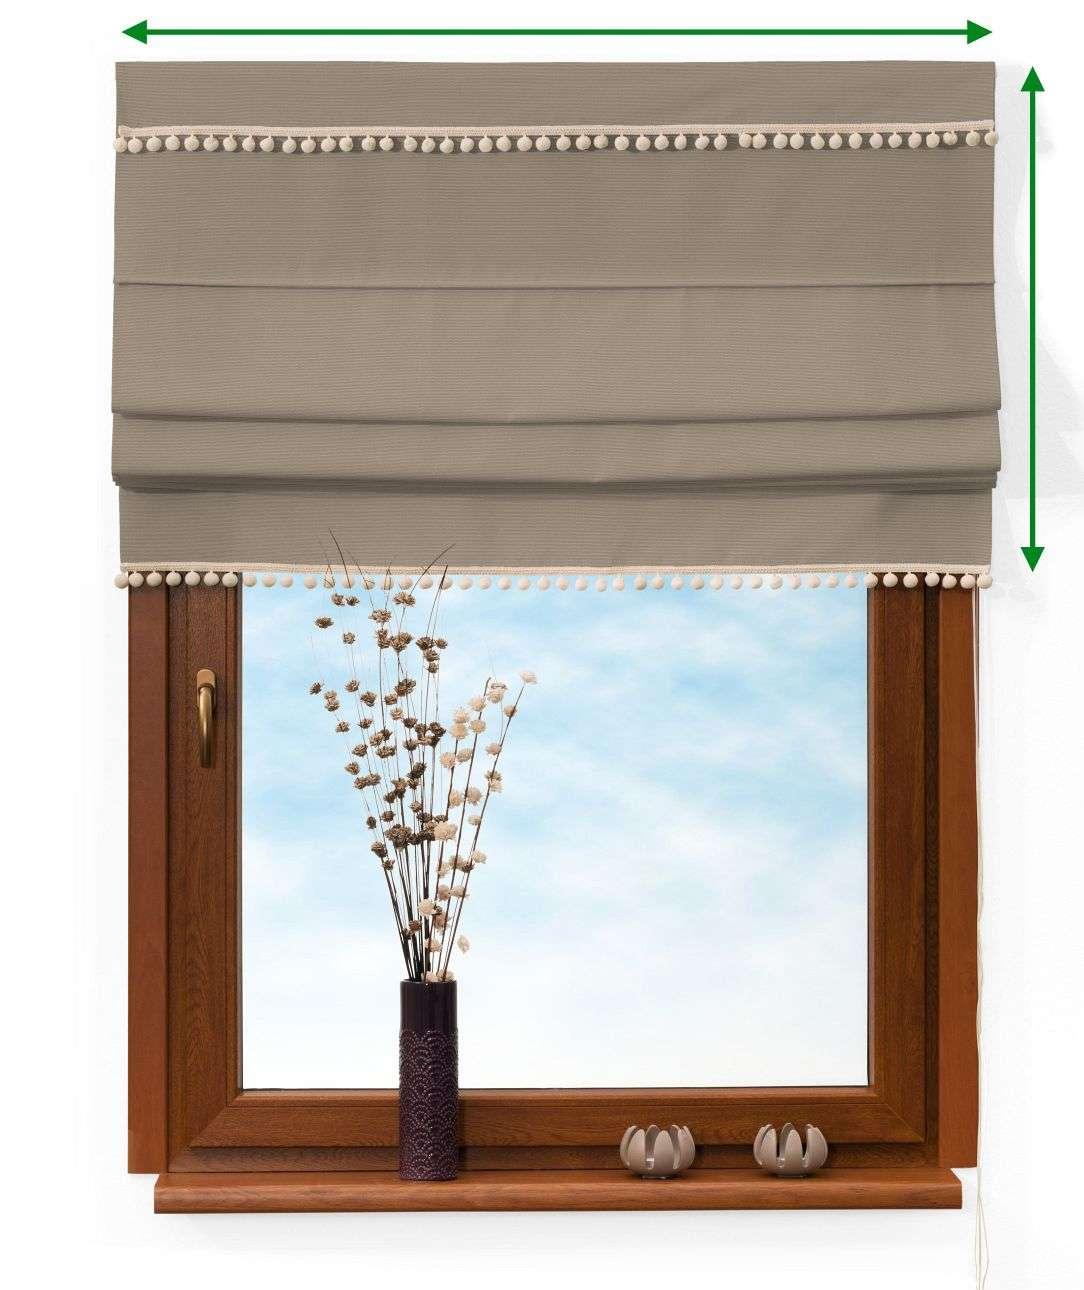 Roleta rímska s brmbolcami V kolekcii Cotton Panama, tkanina: 702-28